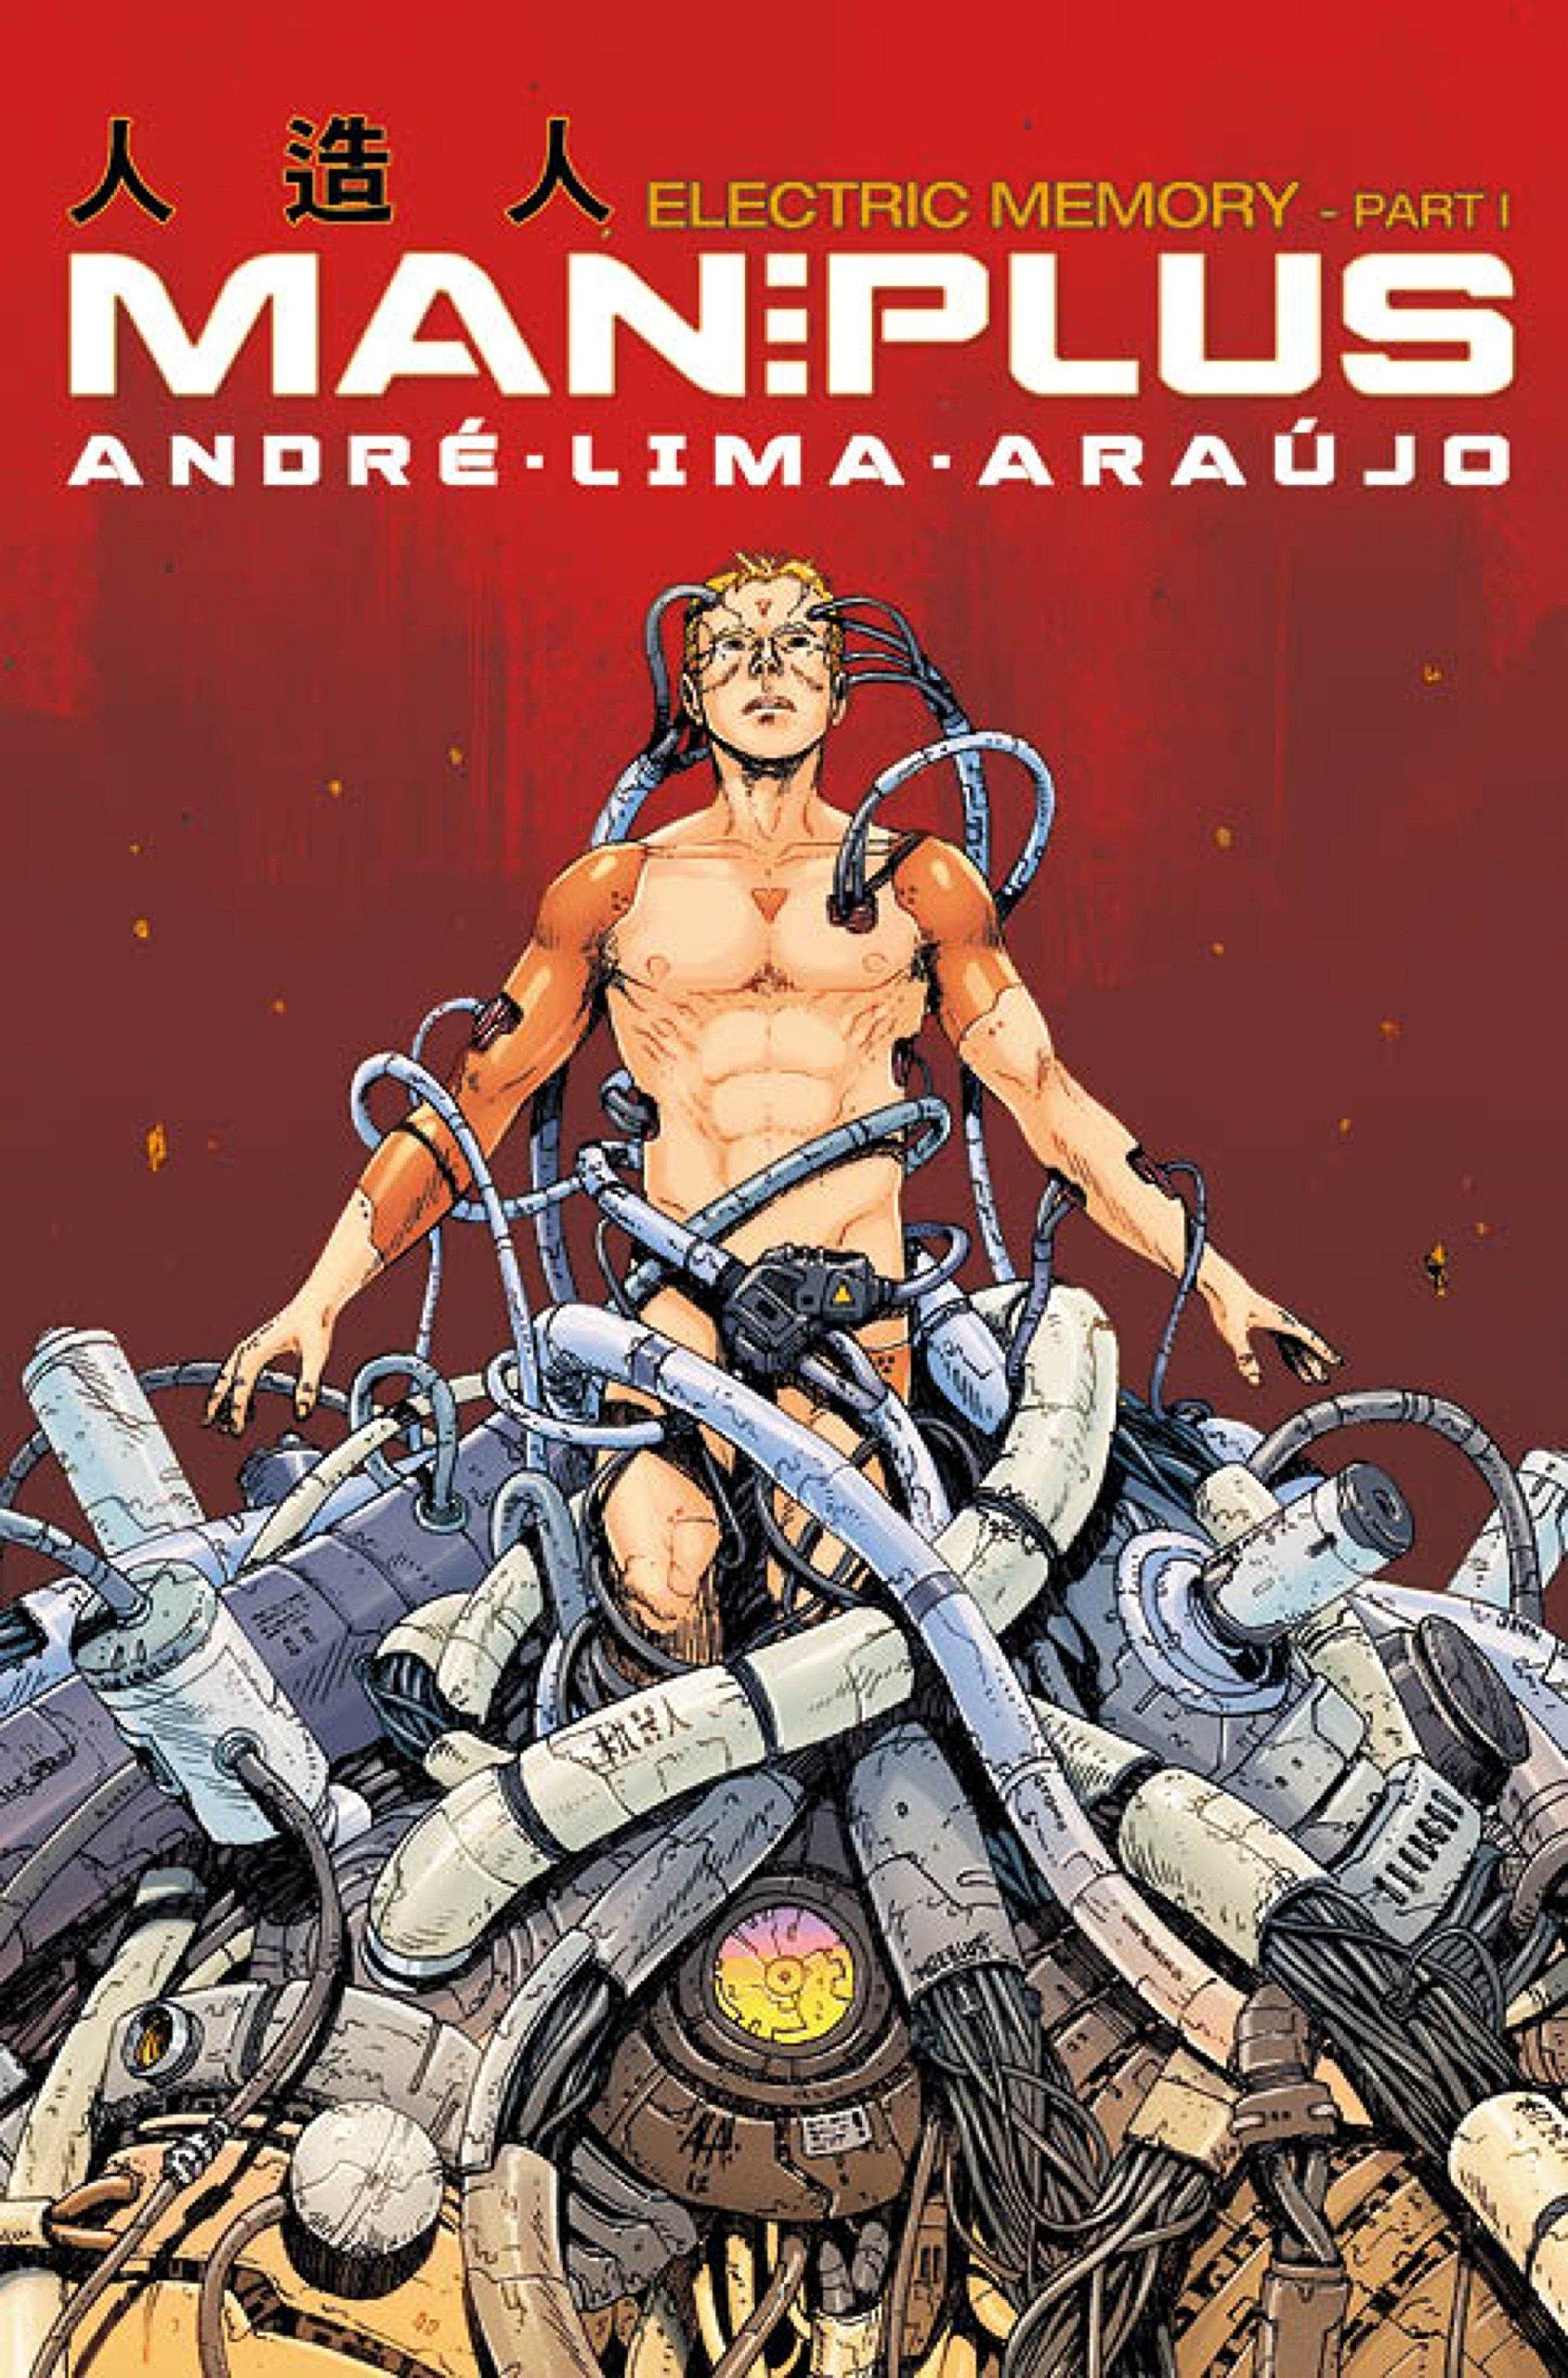 Man Plus: Part I: Electric Memory by Titan Comics